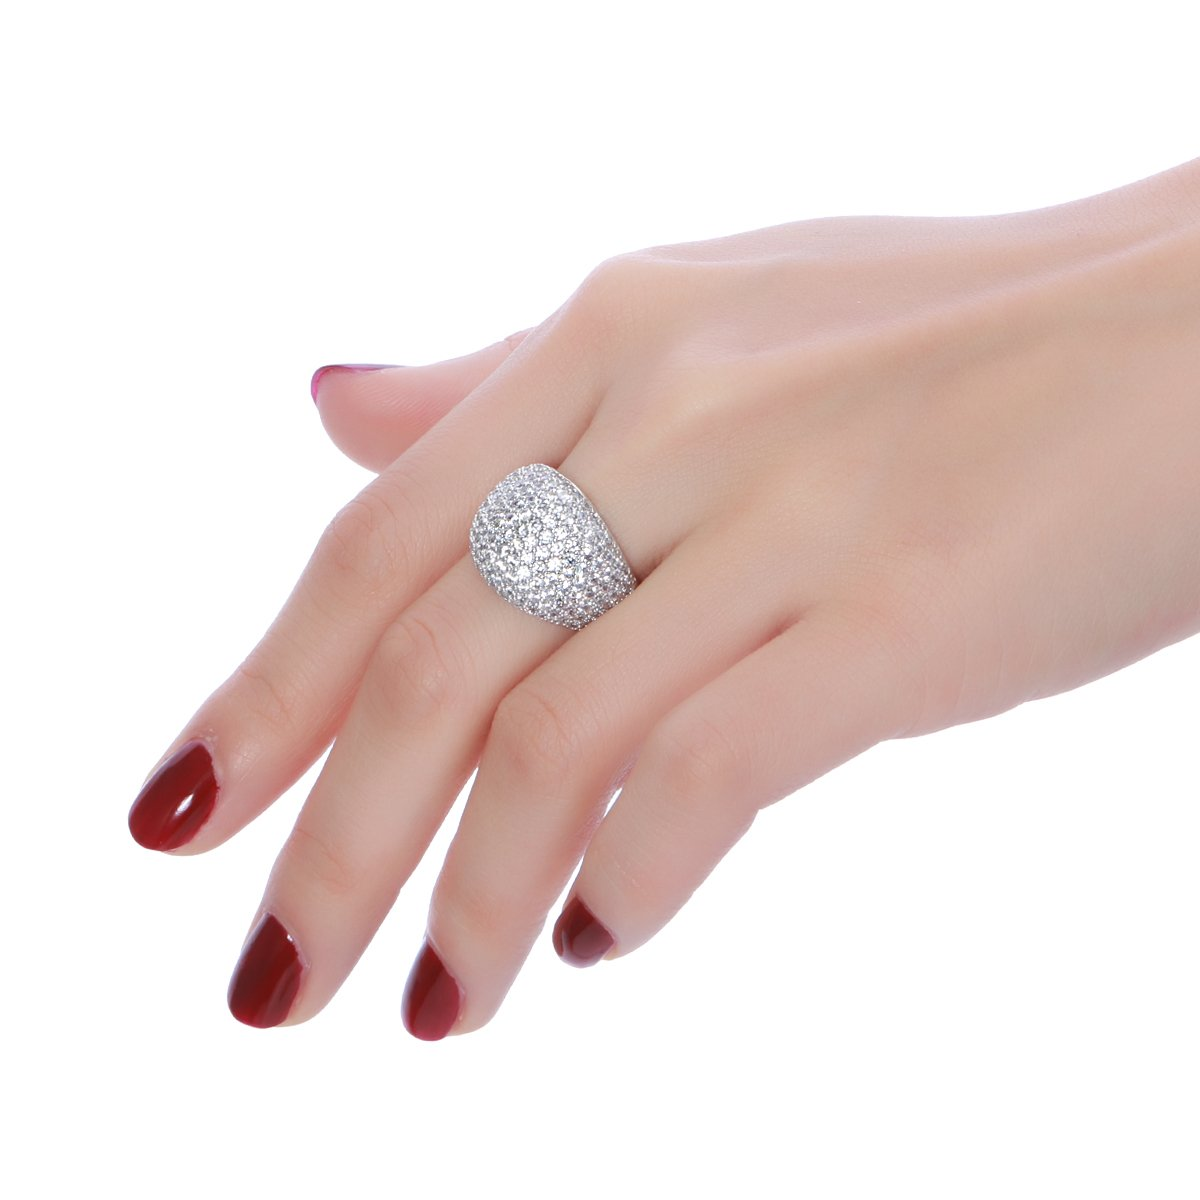 Amazon.com: White Diamond Accent Dome Ring - Cluster Cubic Zirconia ...